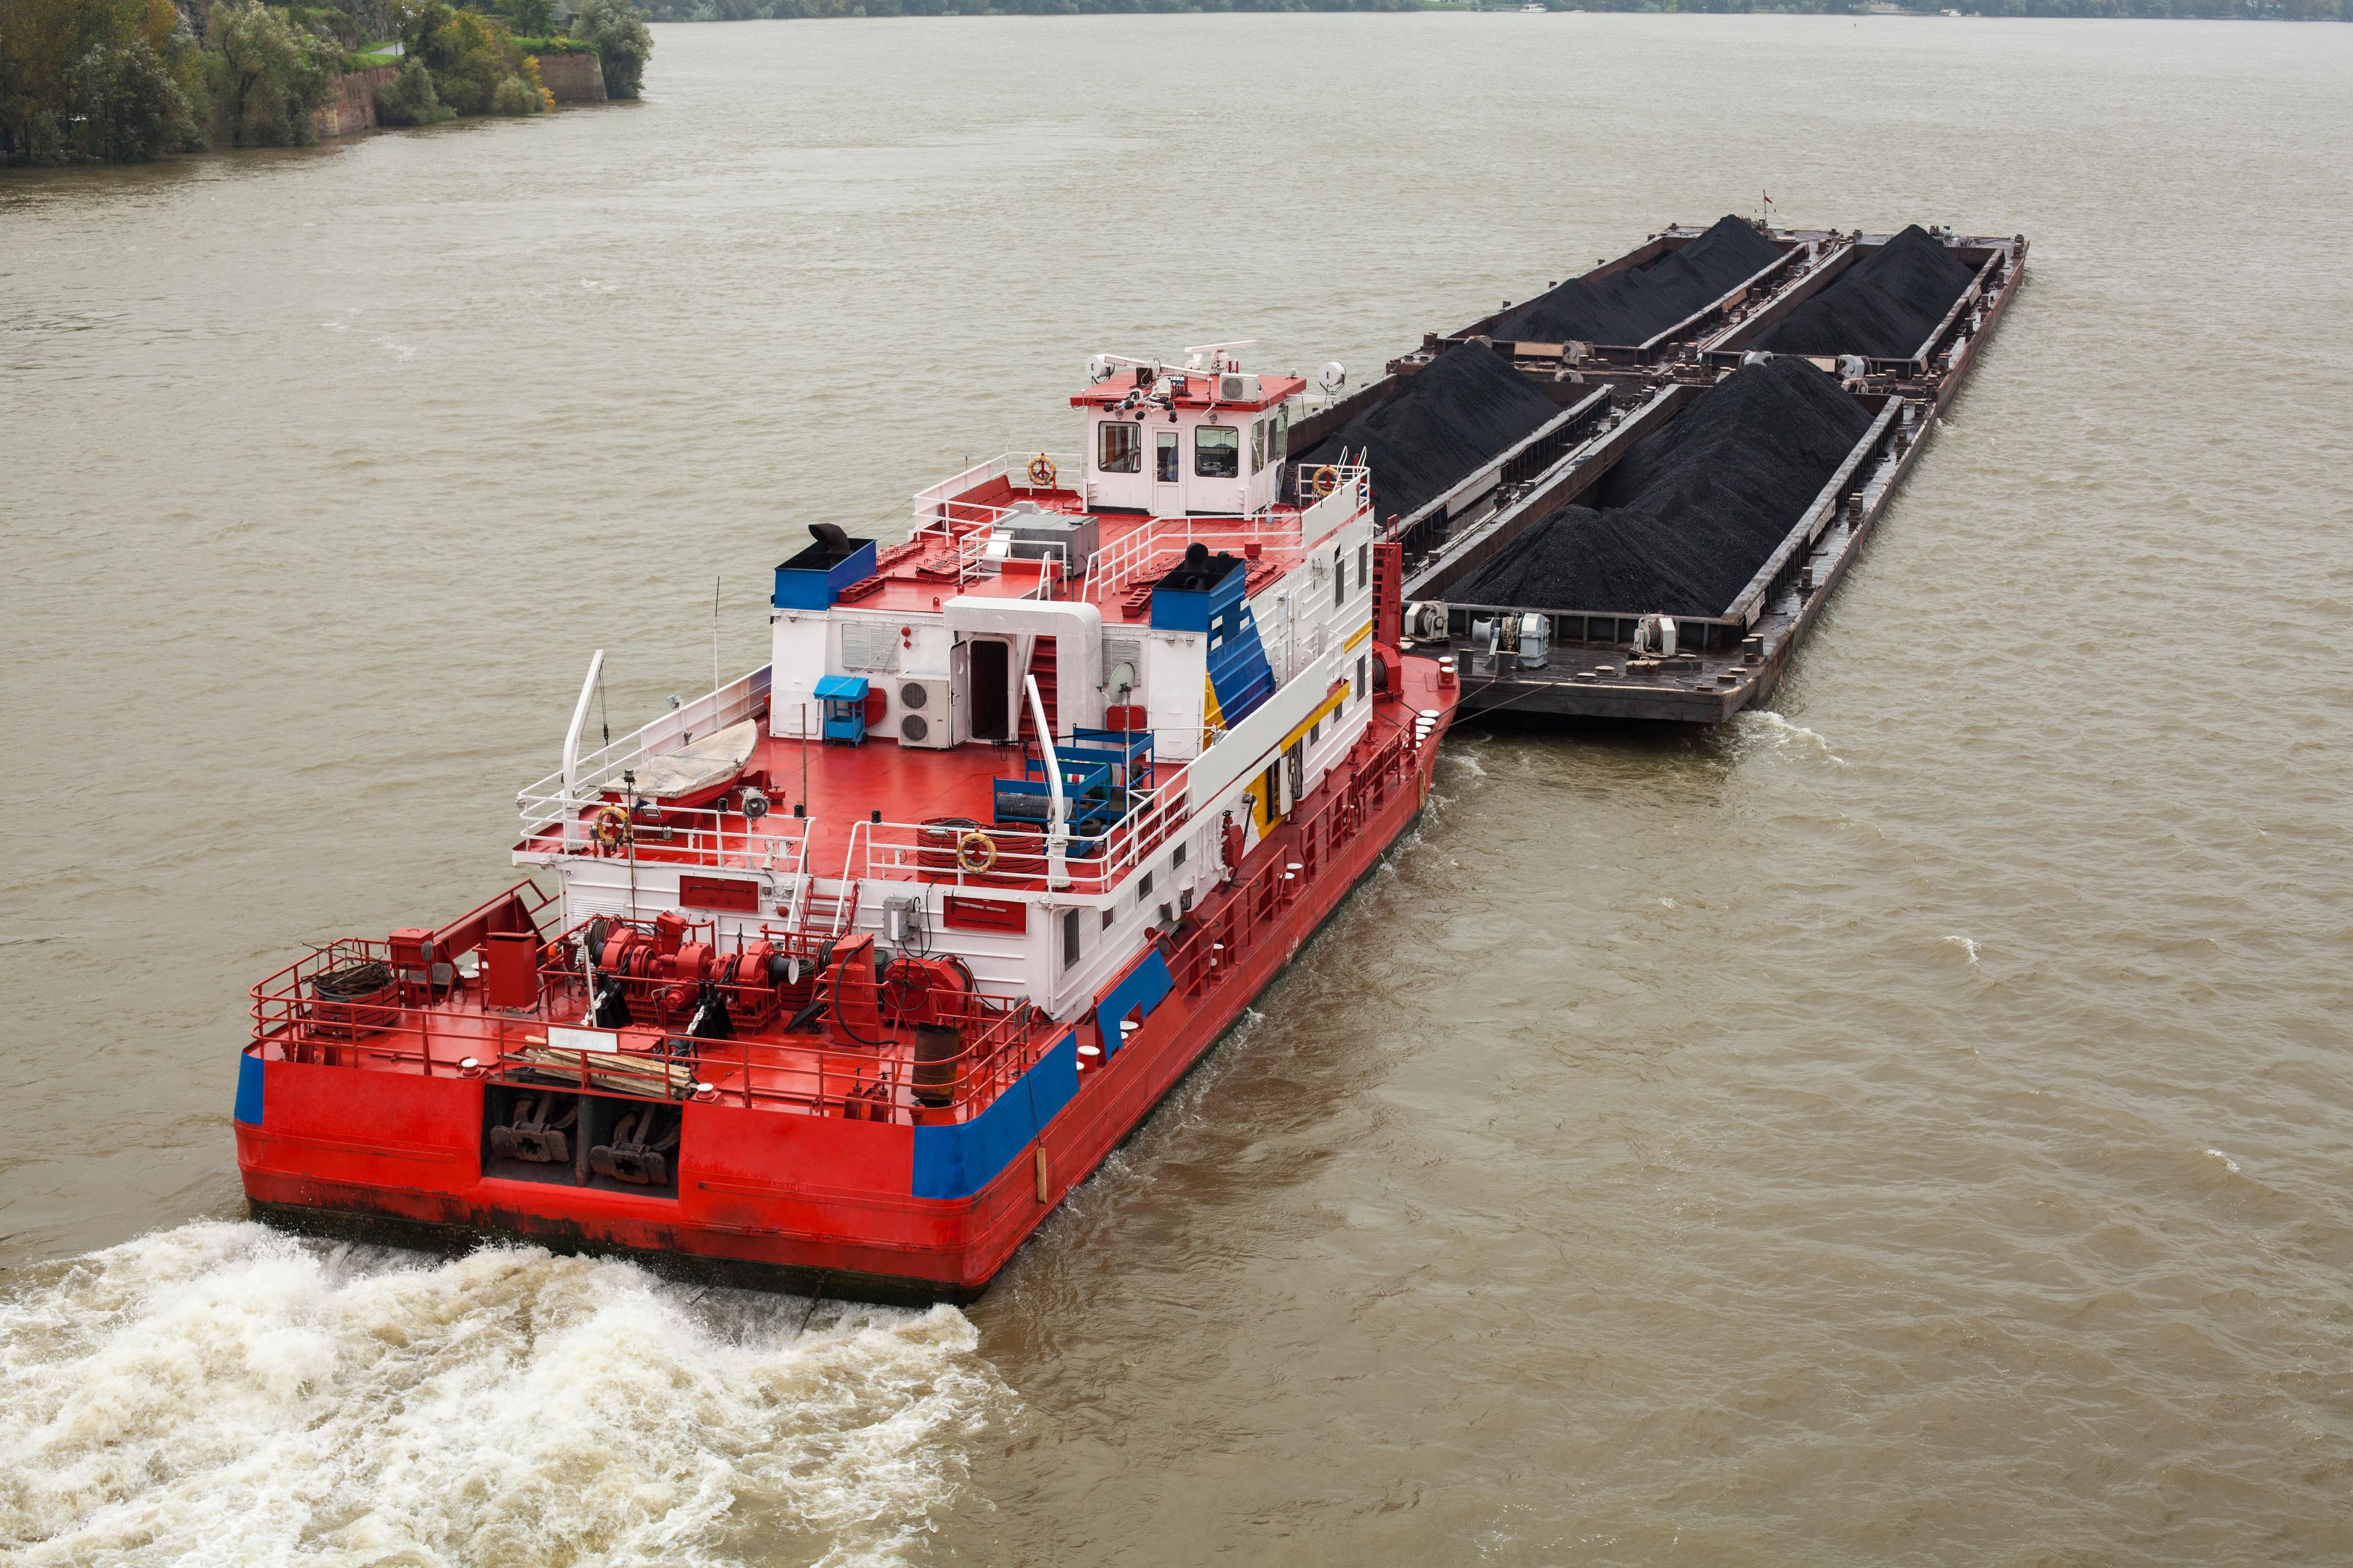 Tugboat Pushing a Heavy Barge